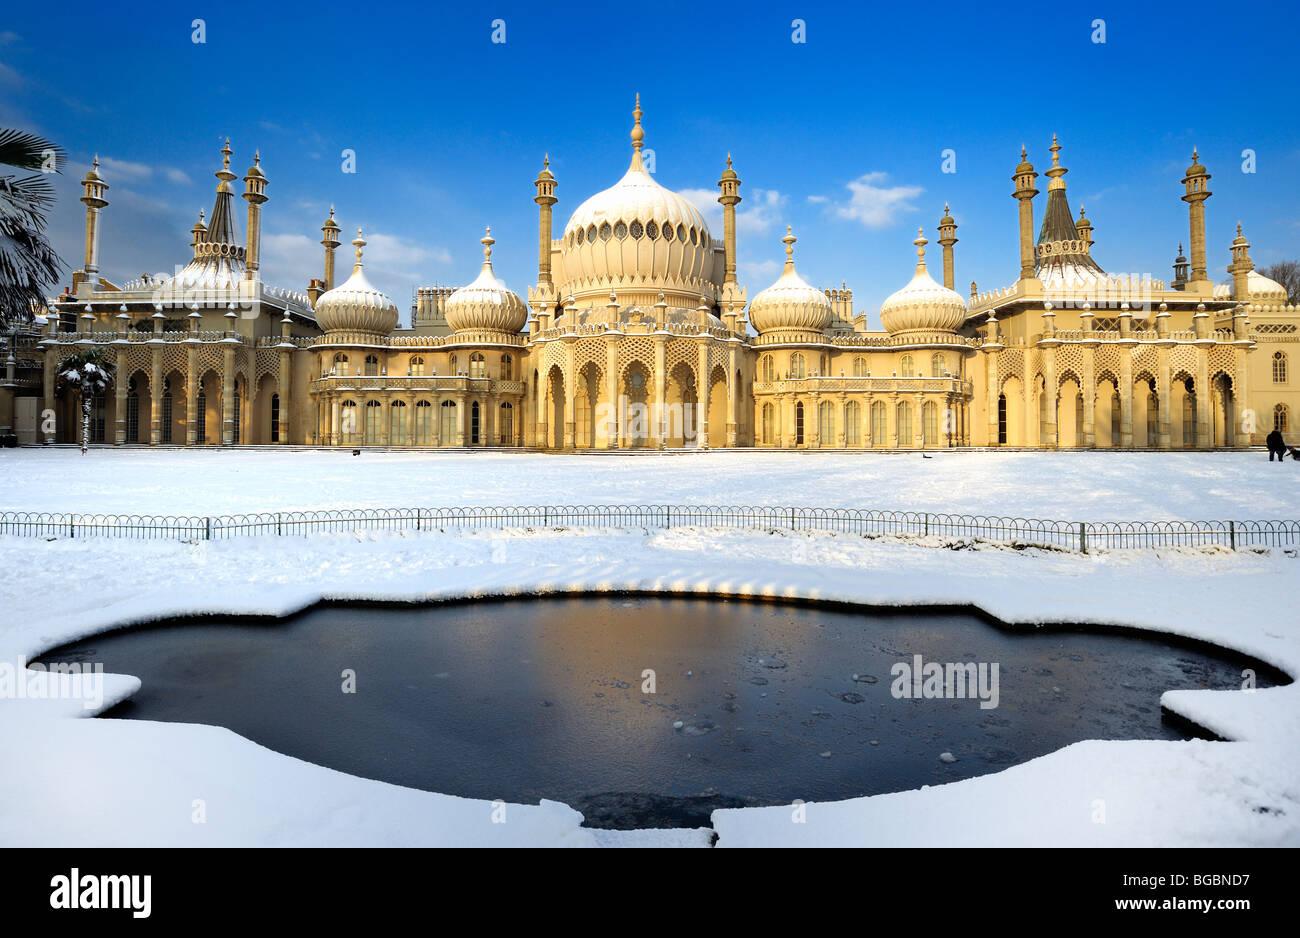 Brighton Pavilion covered in snow Stock Photo